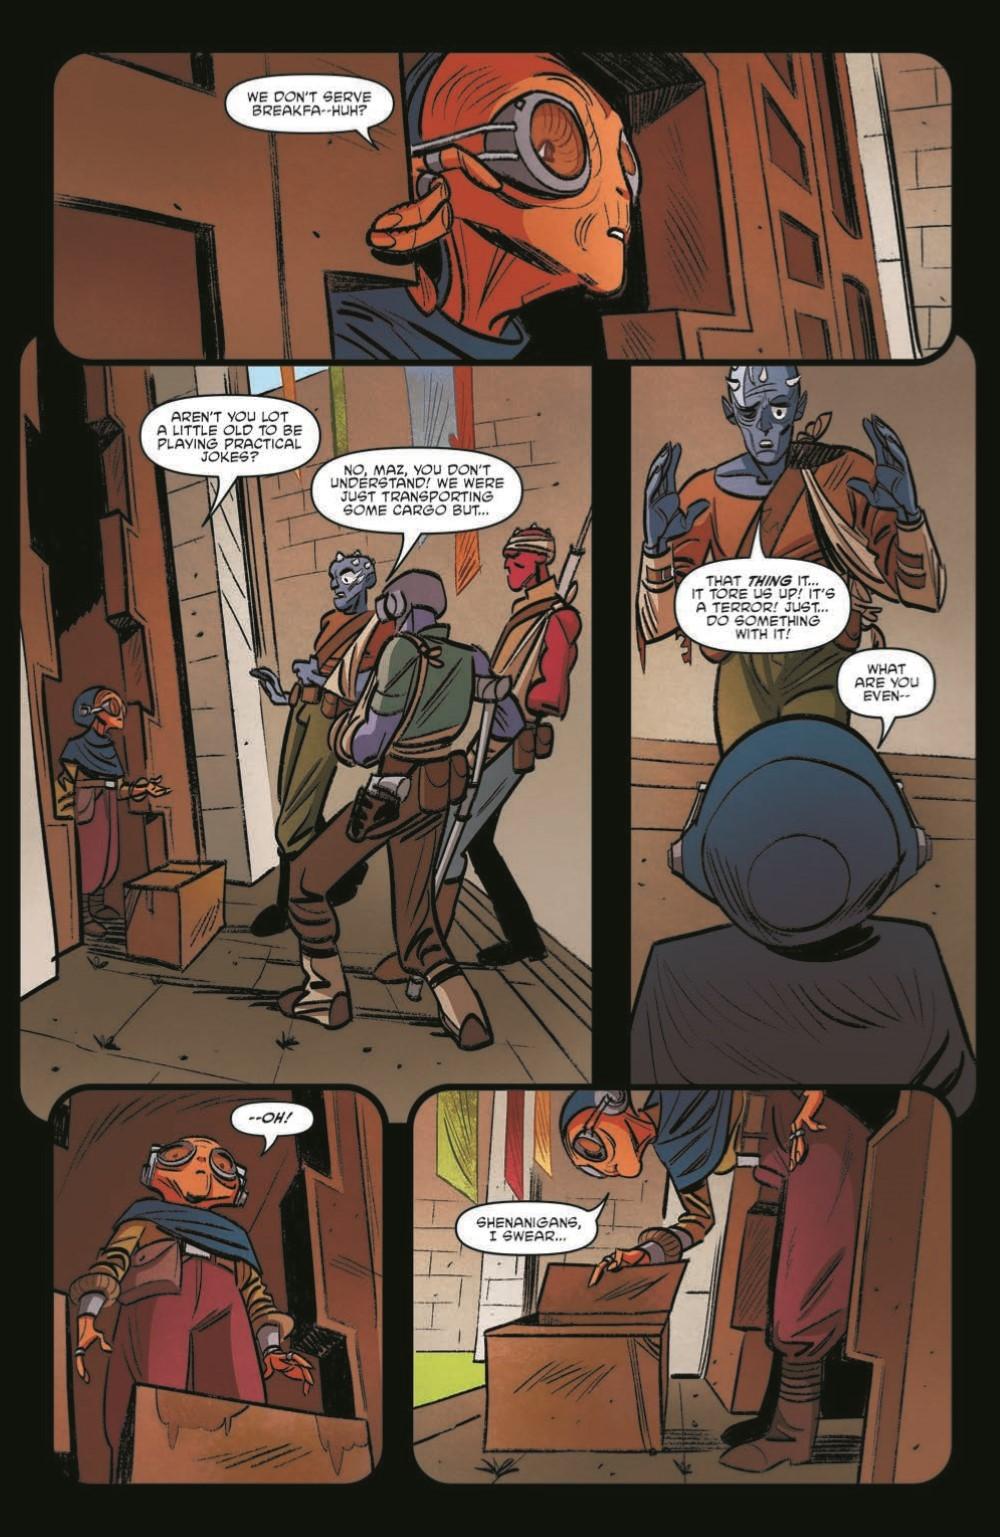 SWAHRA09-pr-5 ComicList Previews: STAR WARS THE HIGH REPUBLIC ADVENTURES #9